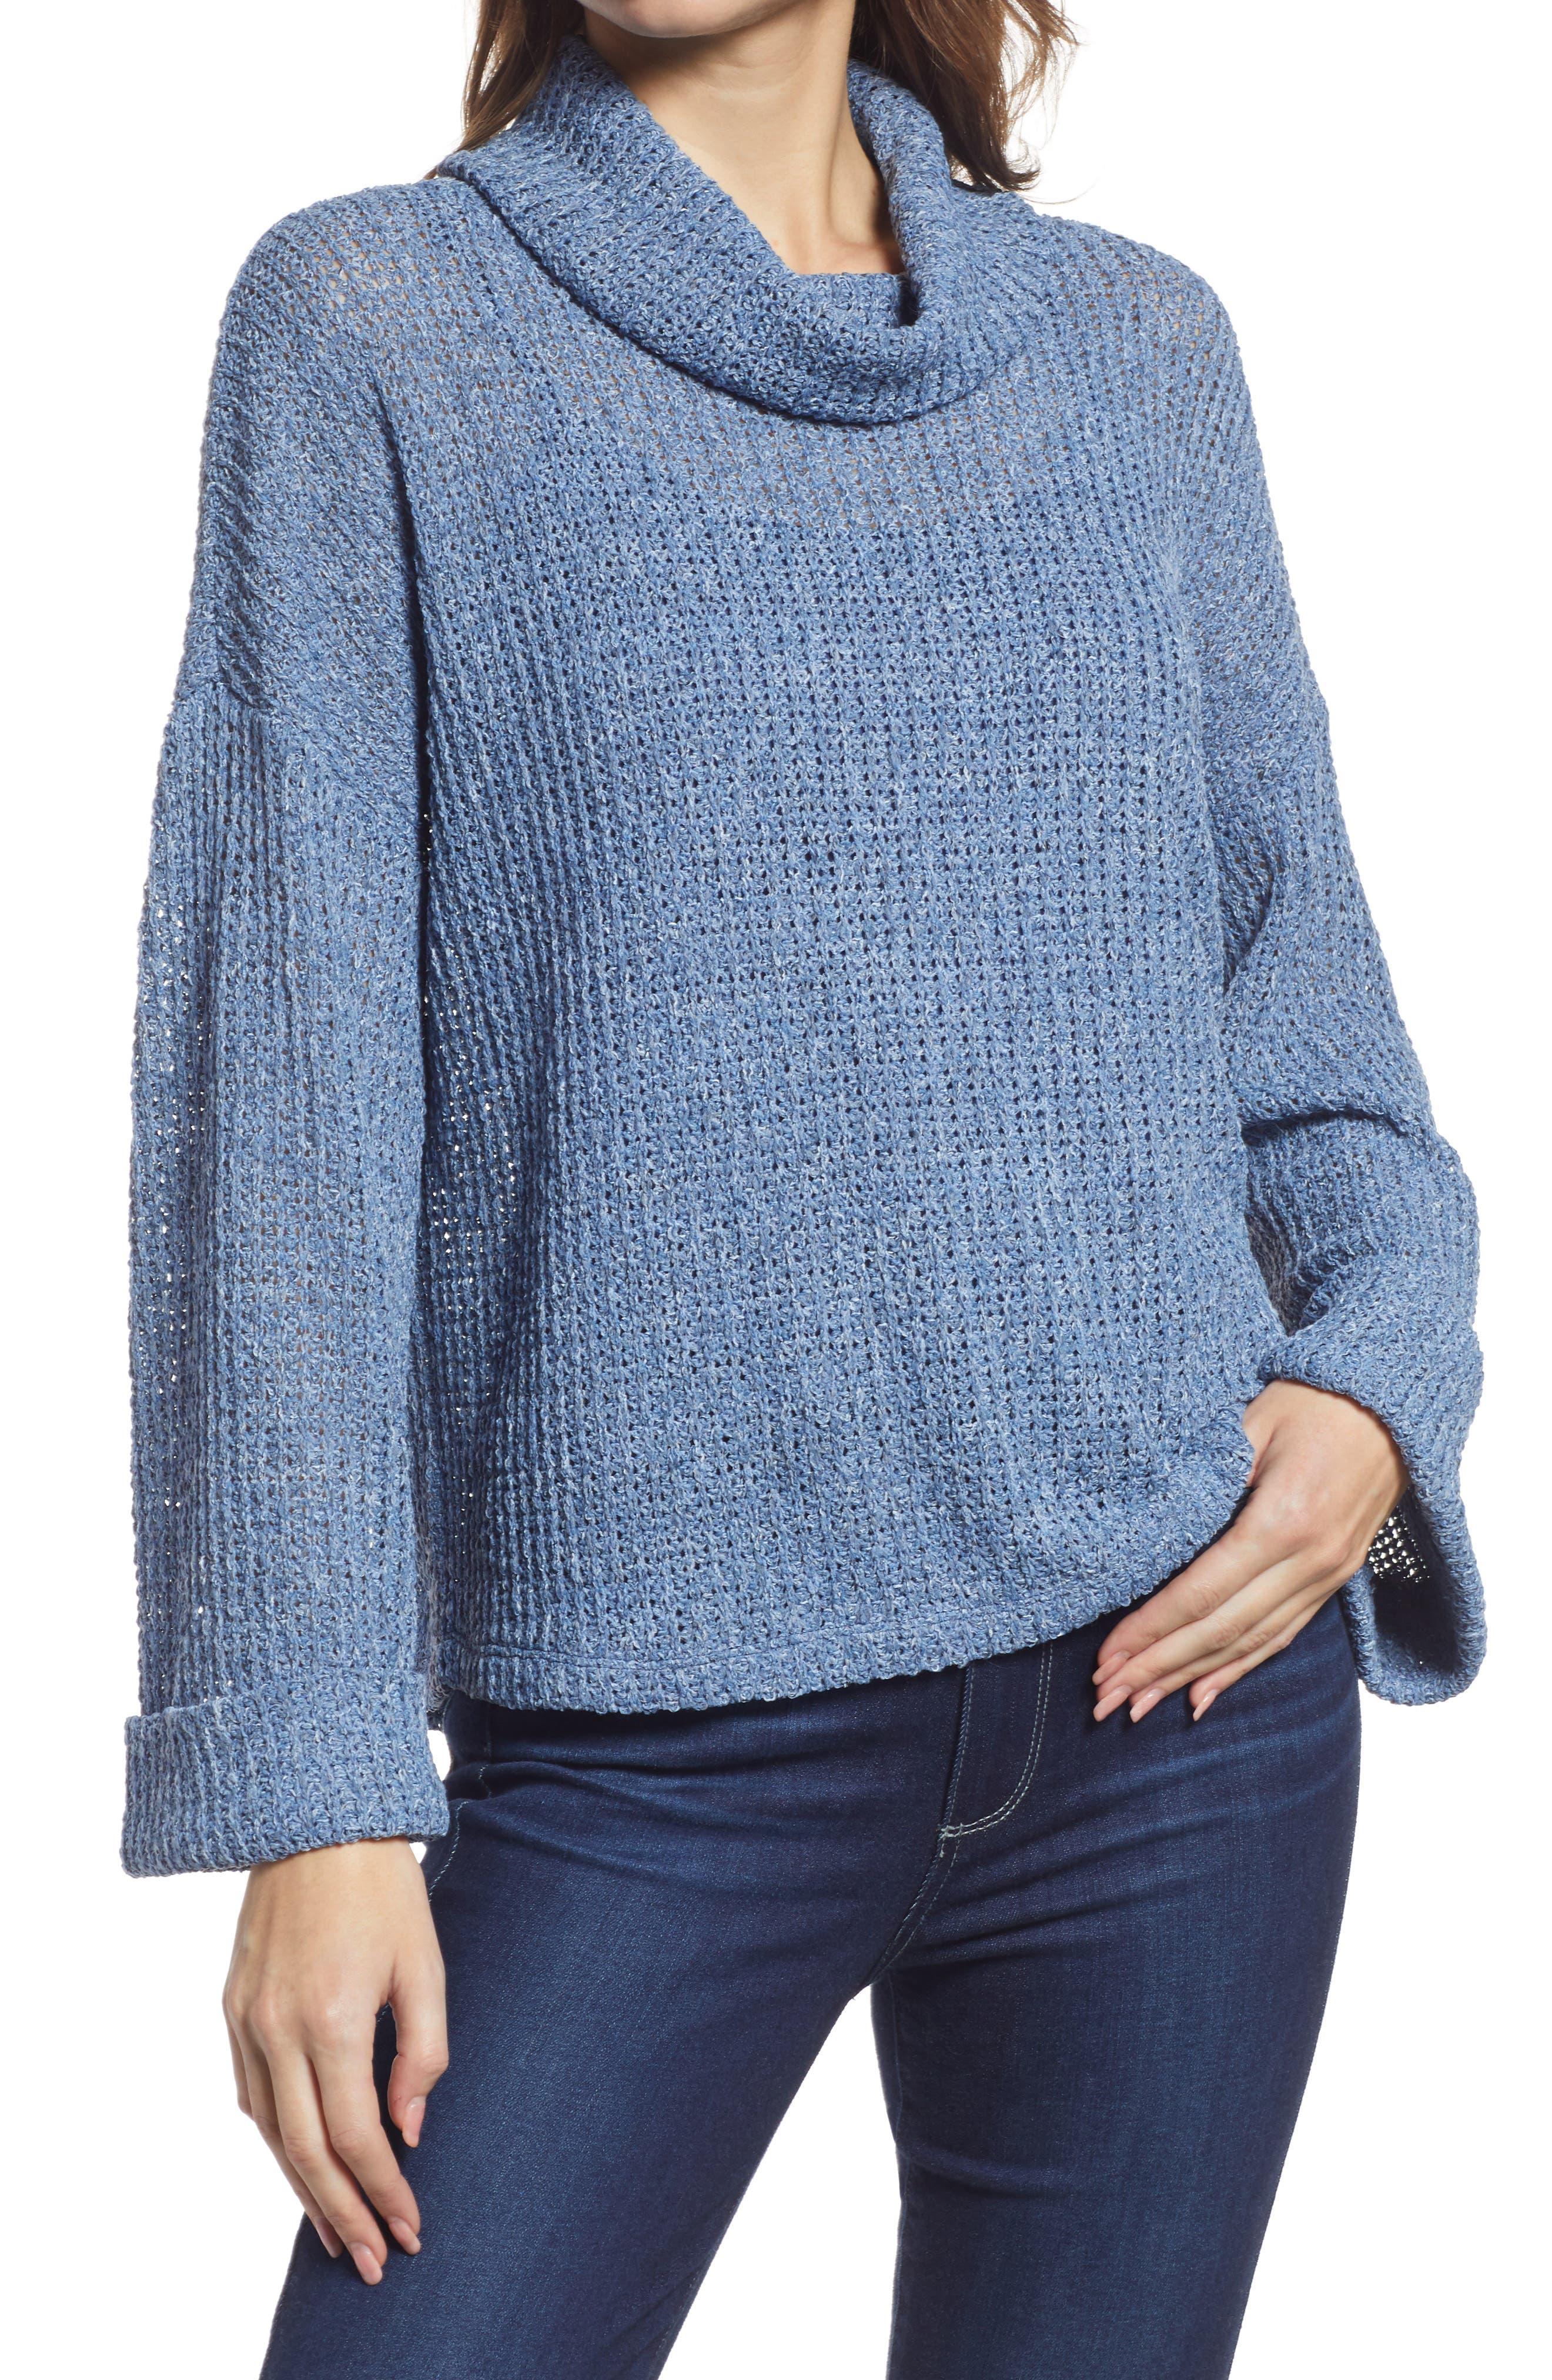 Cowl Neck Tunic Sweater Turtleneck Women/'s Mint Green Long Sleeve Sweater